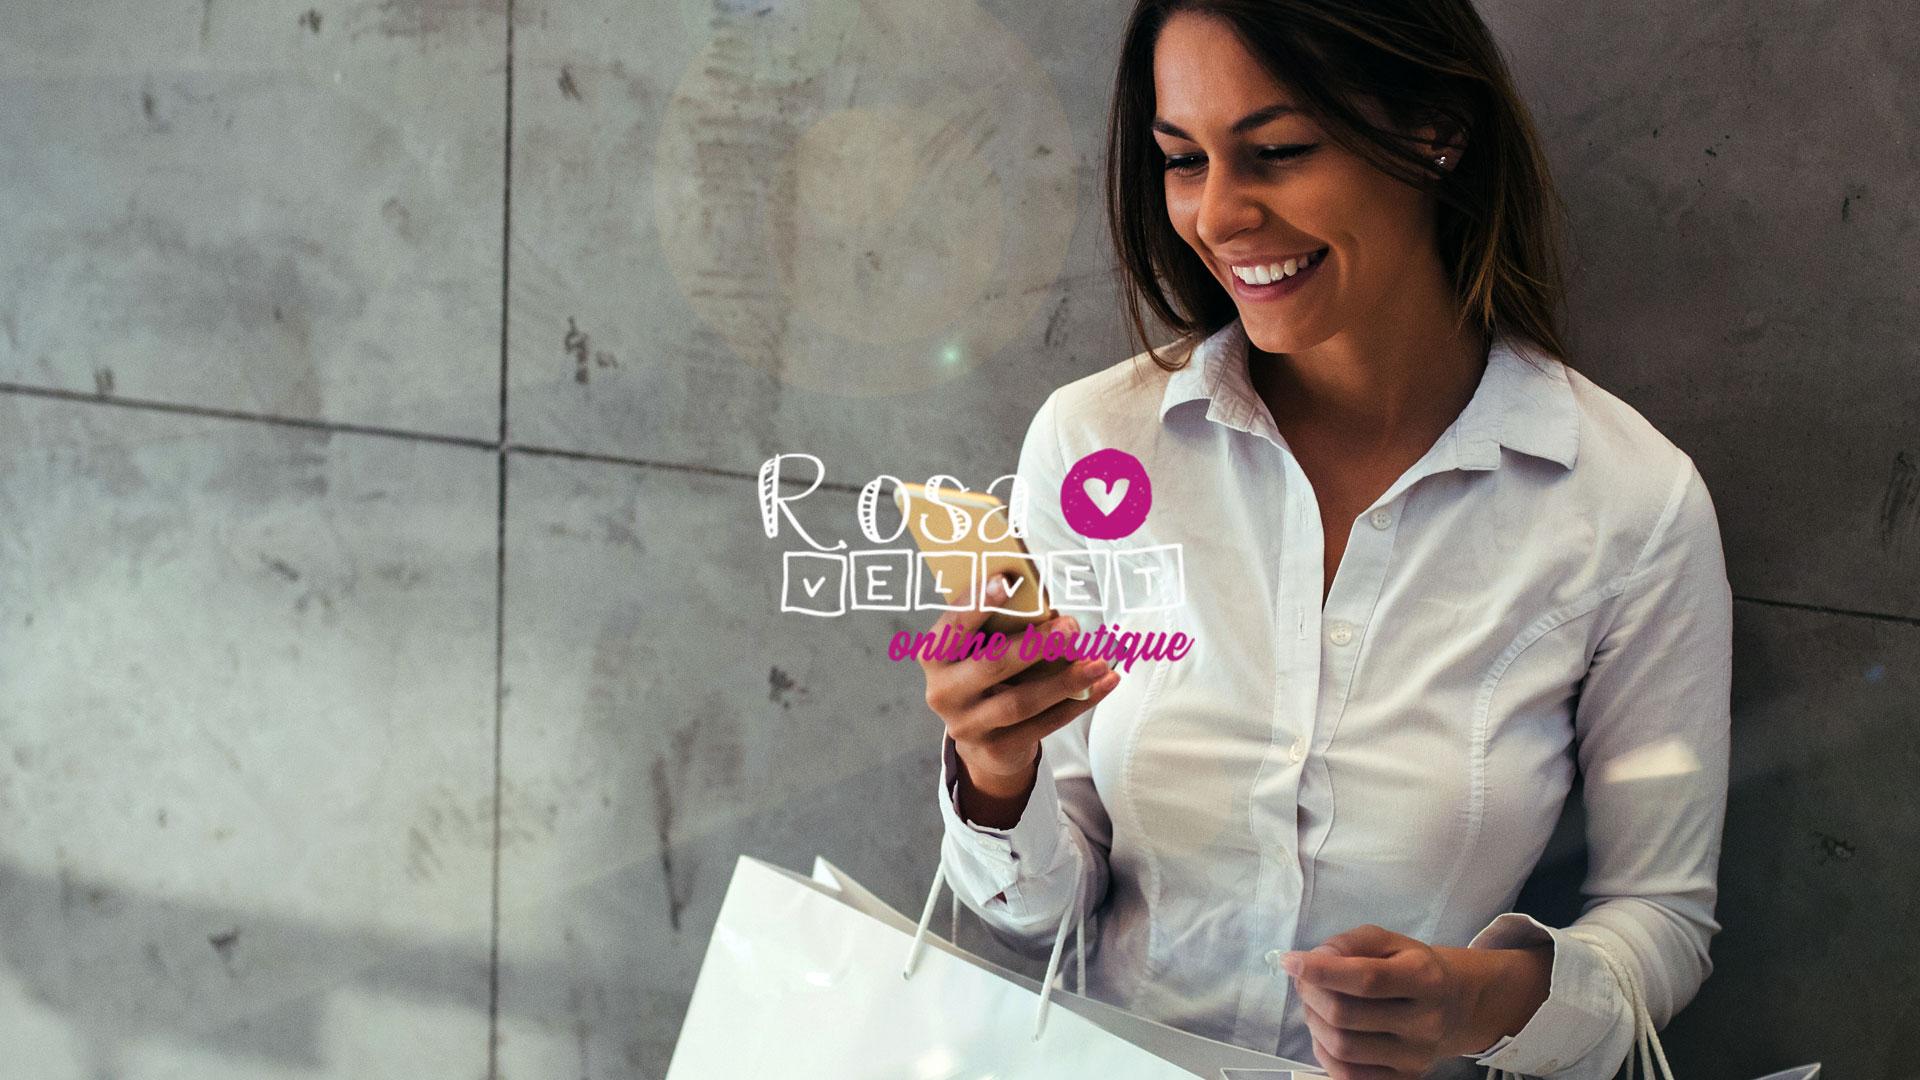 Shoppimg online - sviluppo e-commerce personalizzato